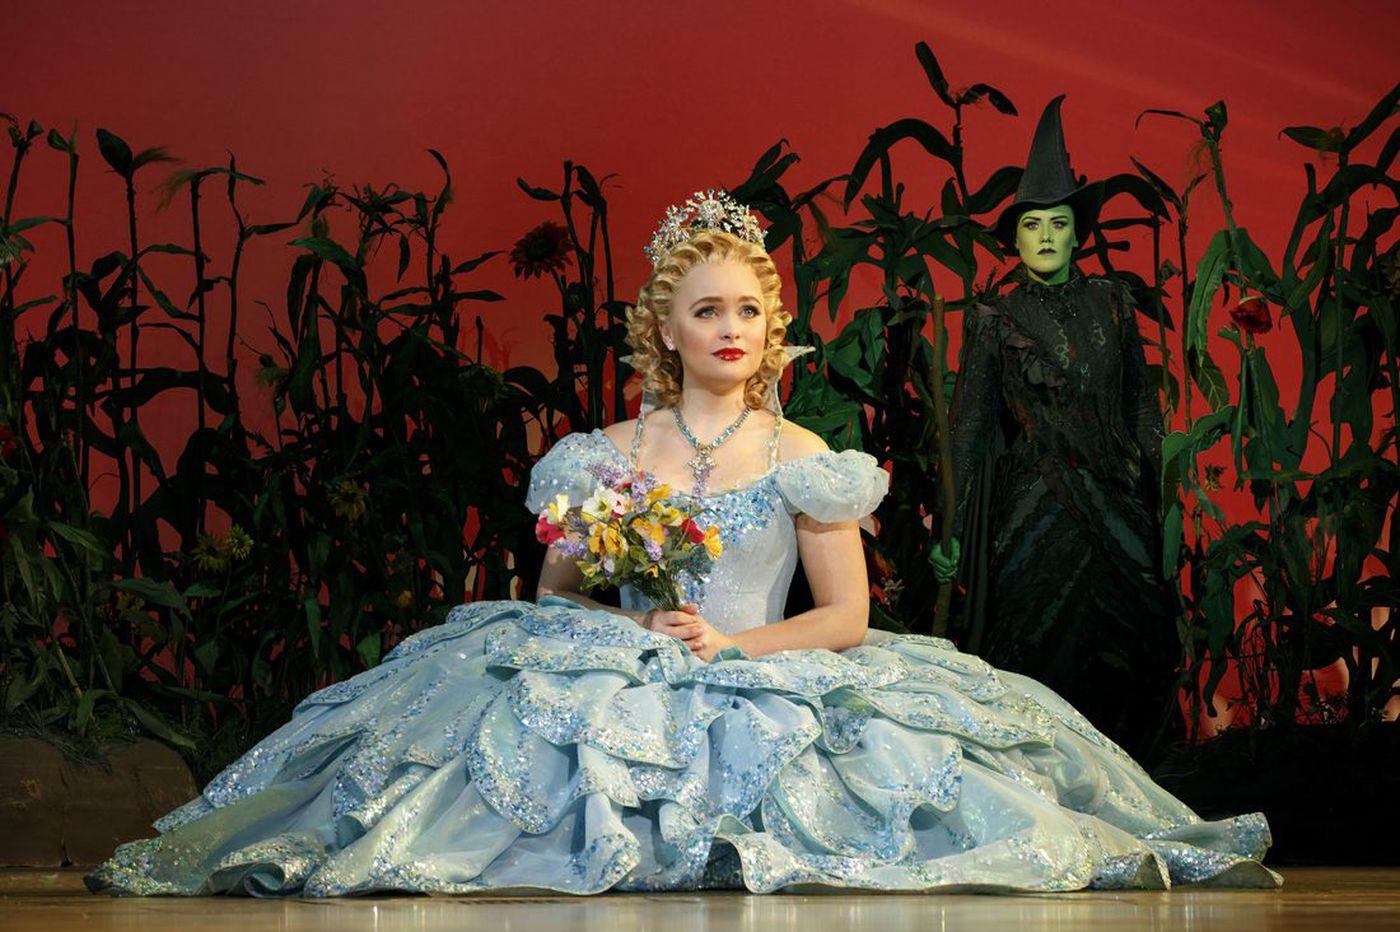 We're all stars, performing our lives | Francesca Serritella